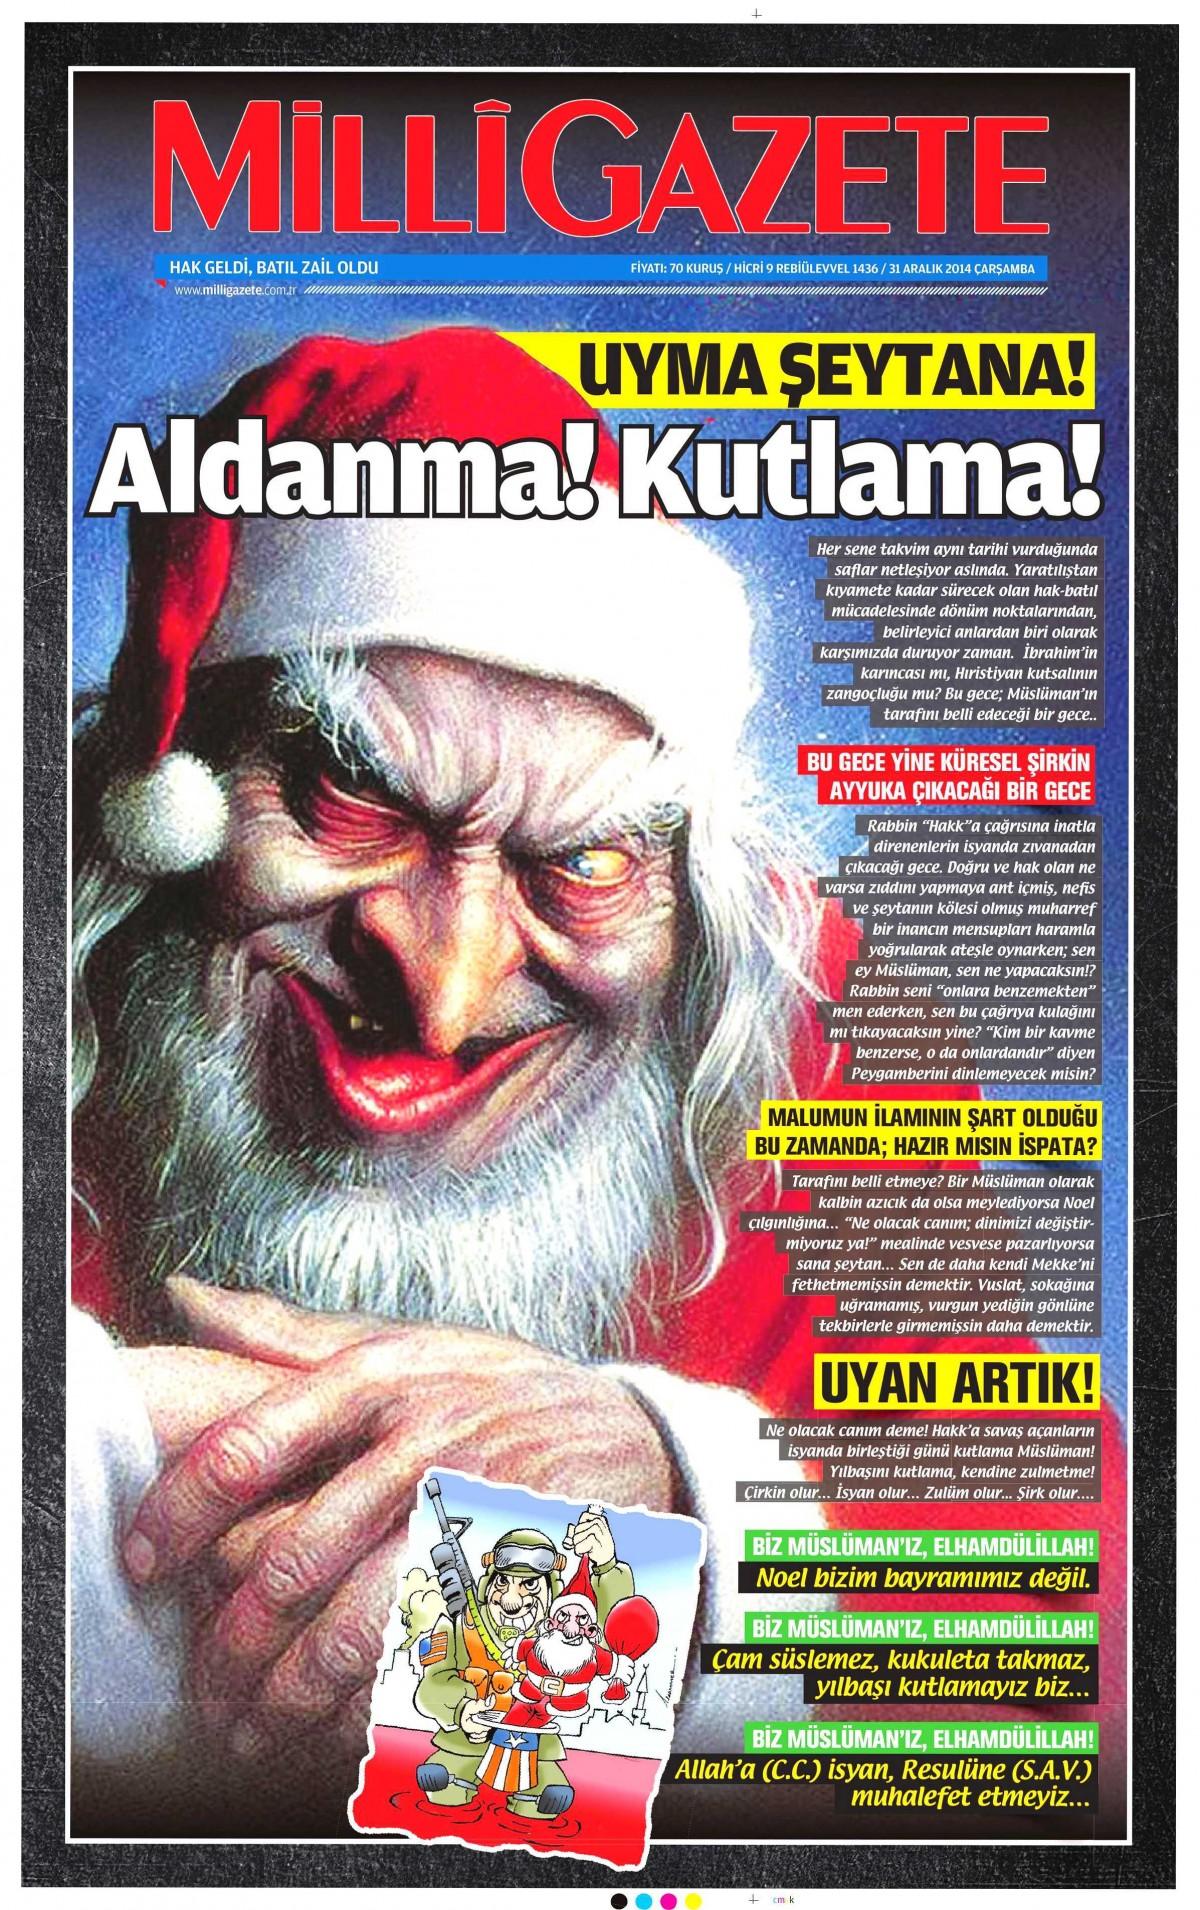 milli-gazete_2014-12-31-1.jpg